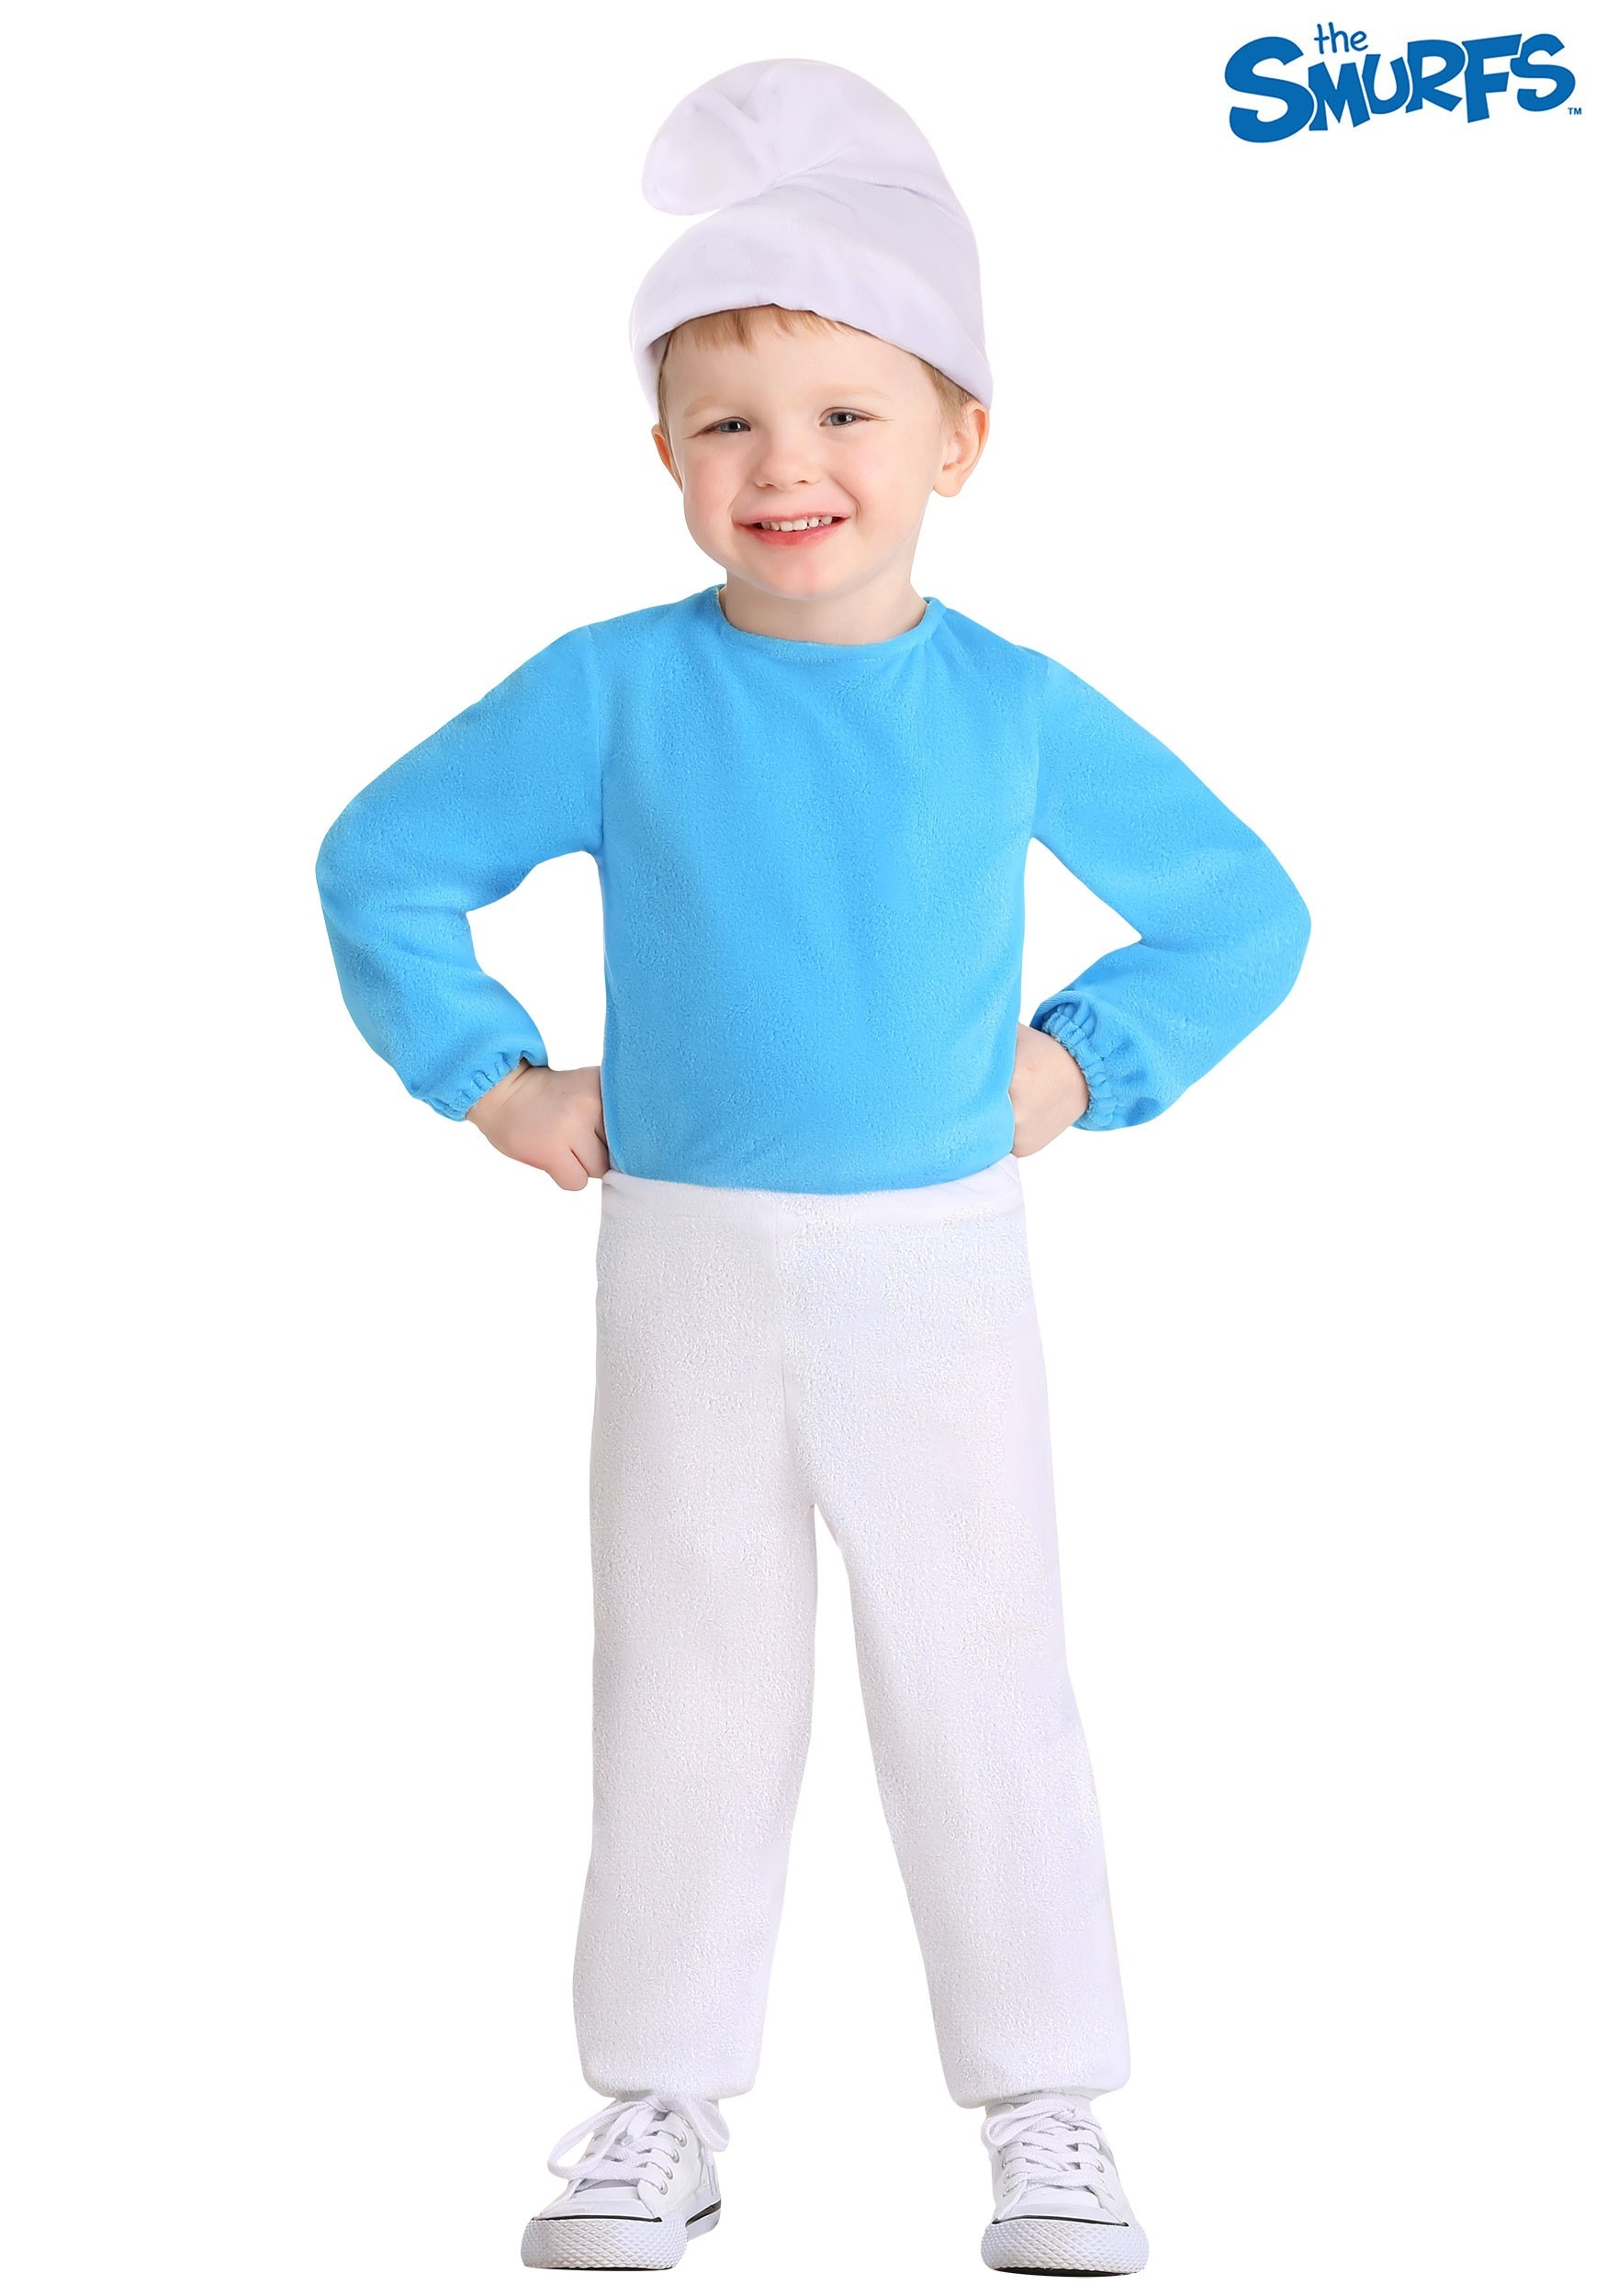 The Smurfs Child Costume